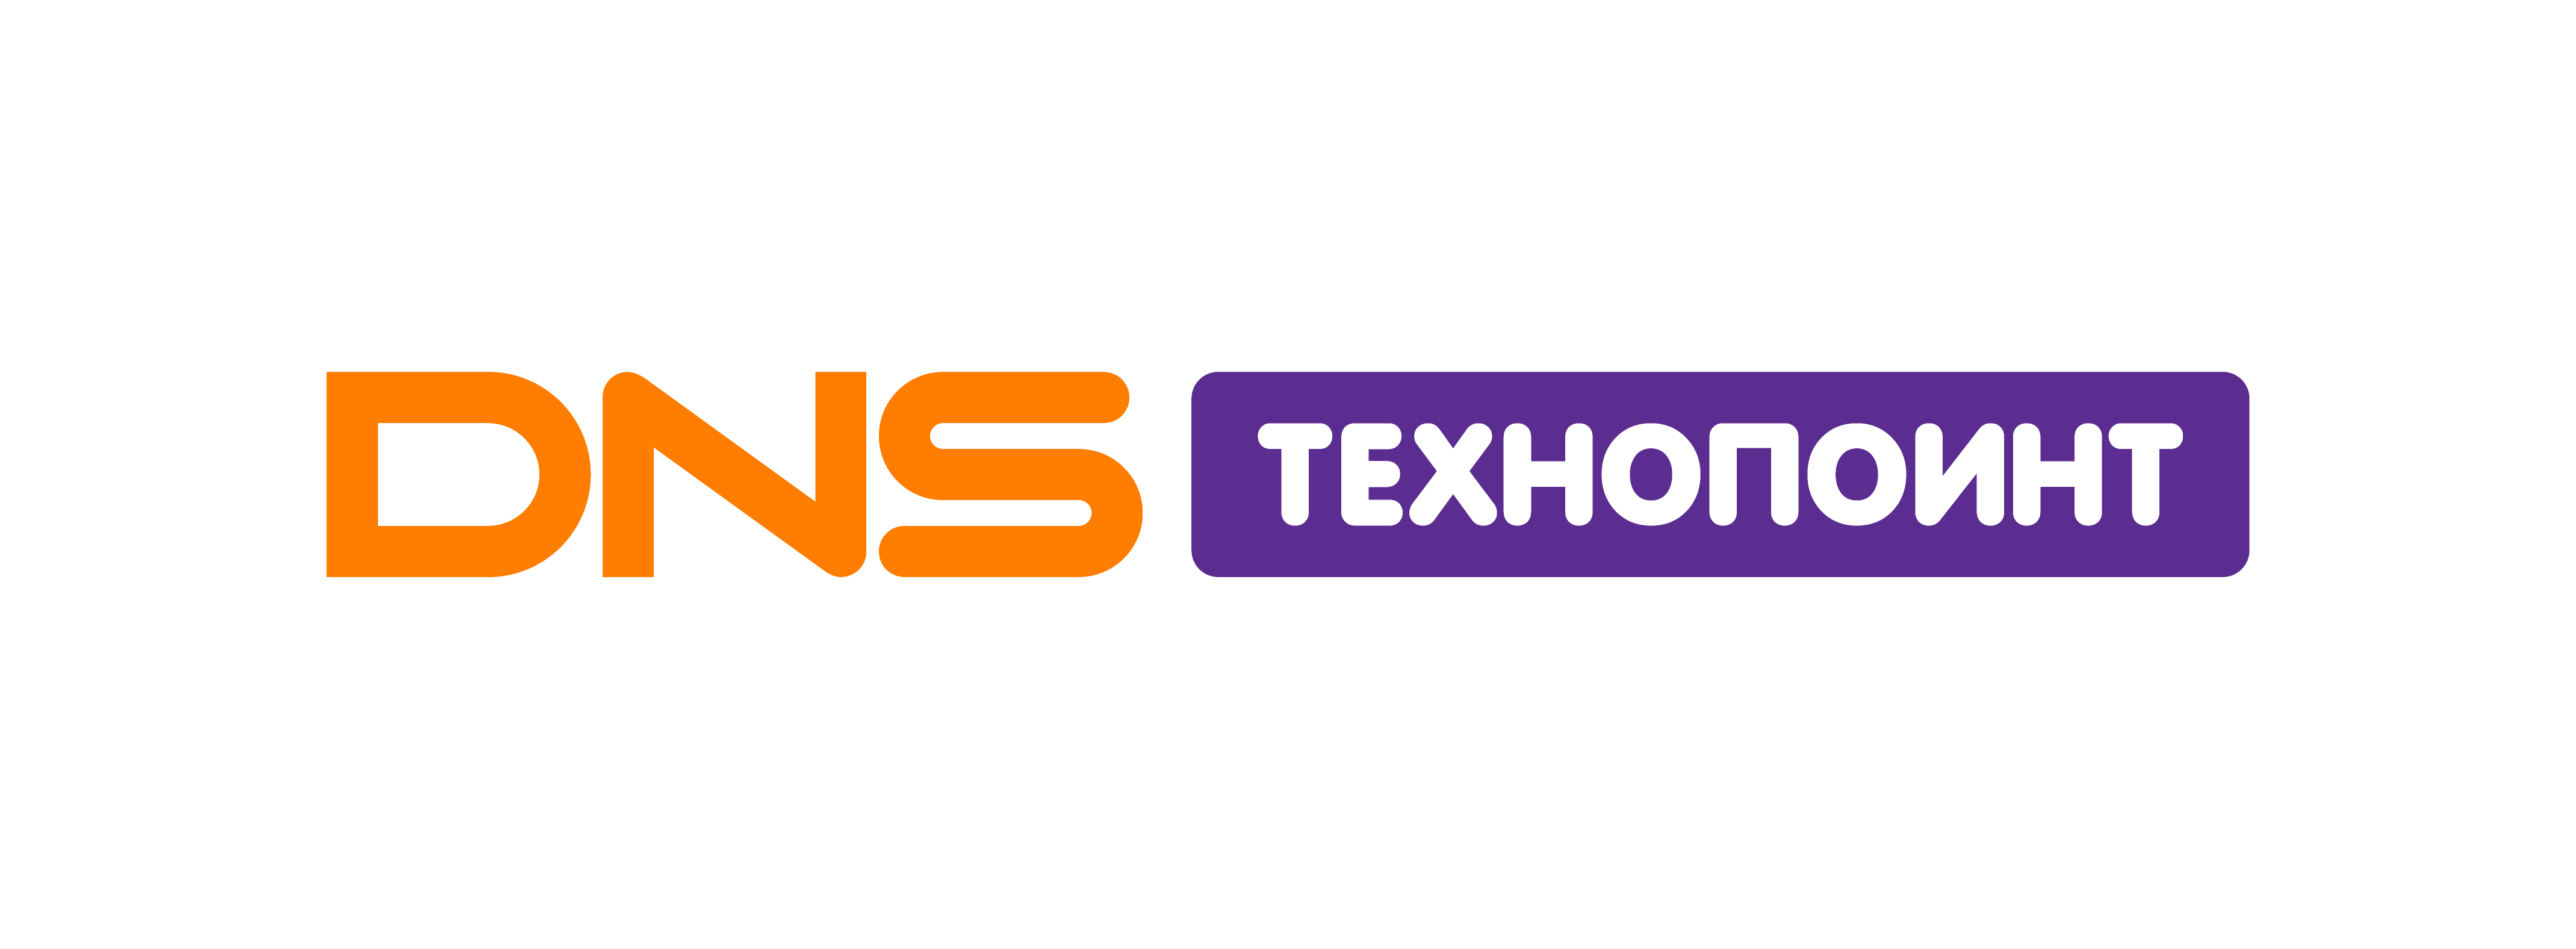 Dns Технопоинт Интернет Магазин